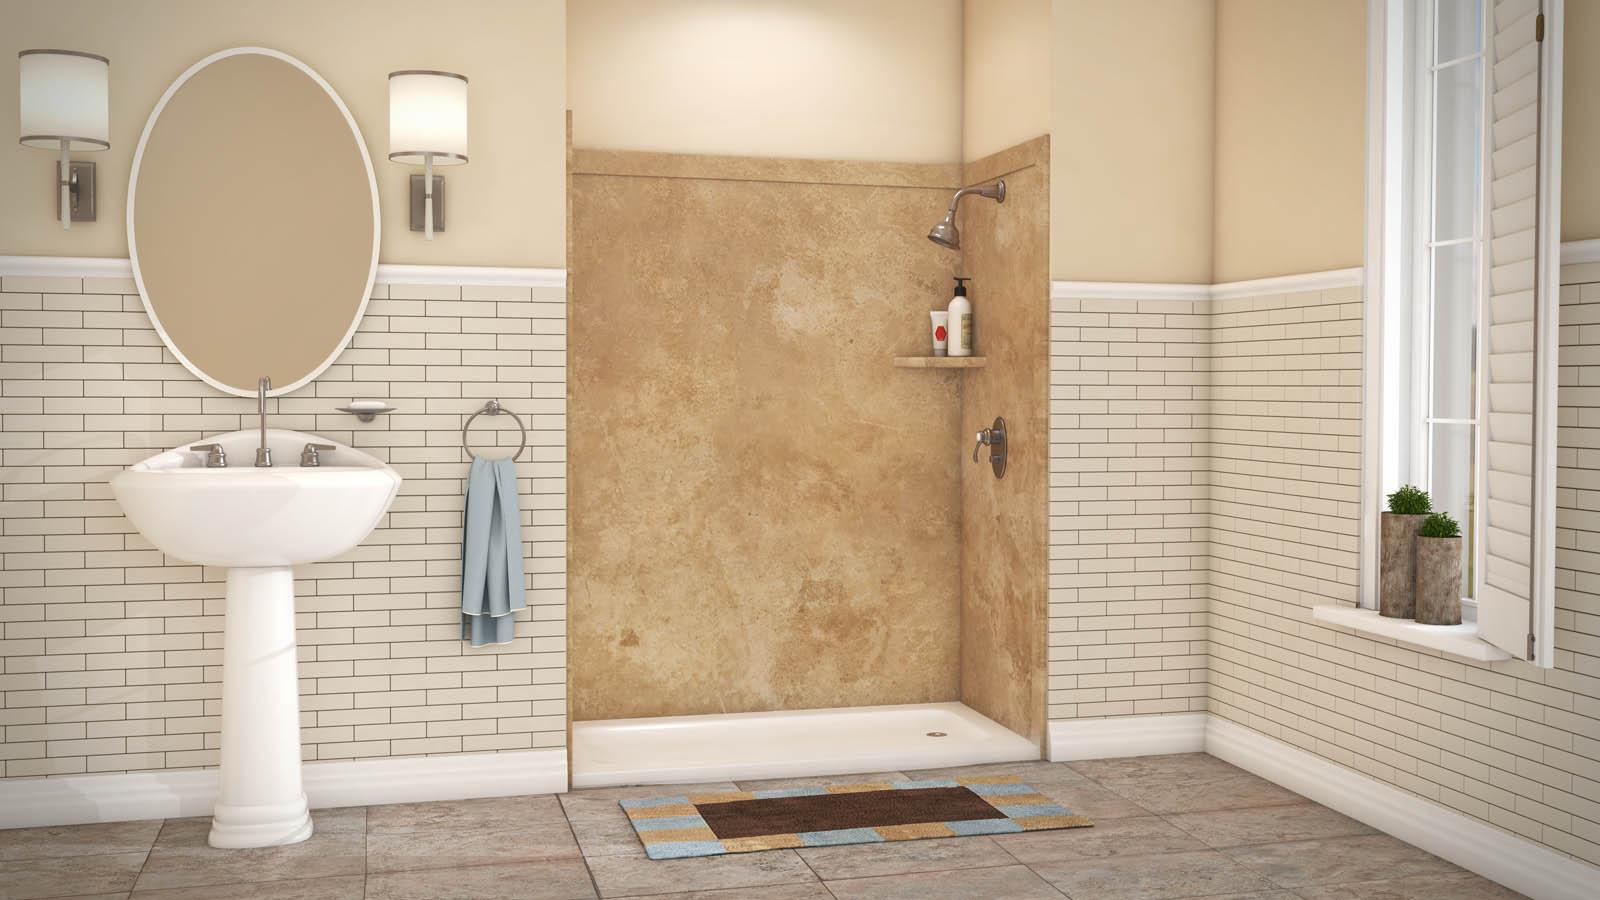 ADAPTABLE 3-WALL SHOWER KIT – Flexstone Bath Kits